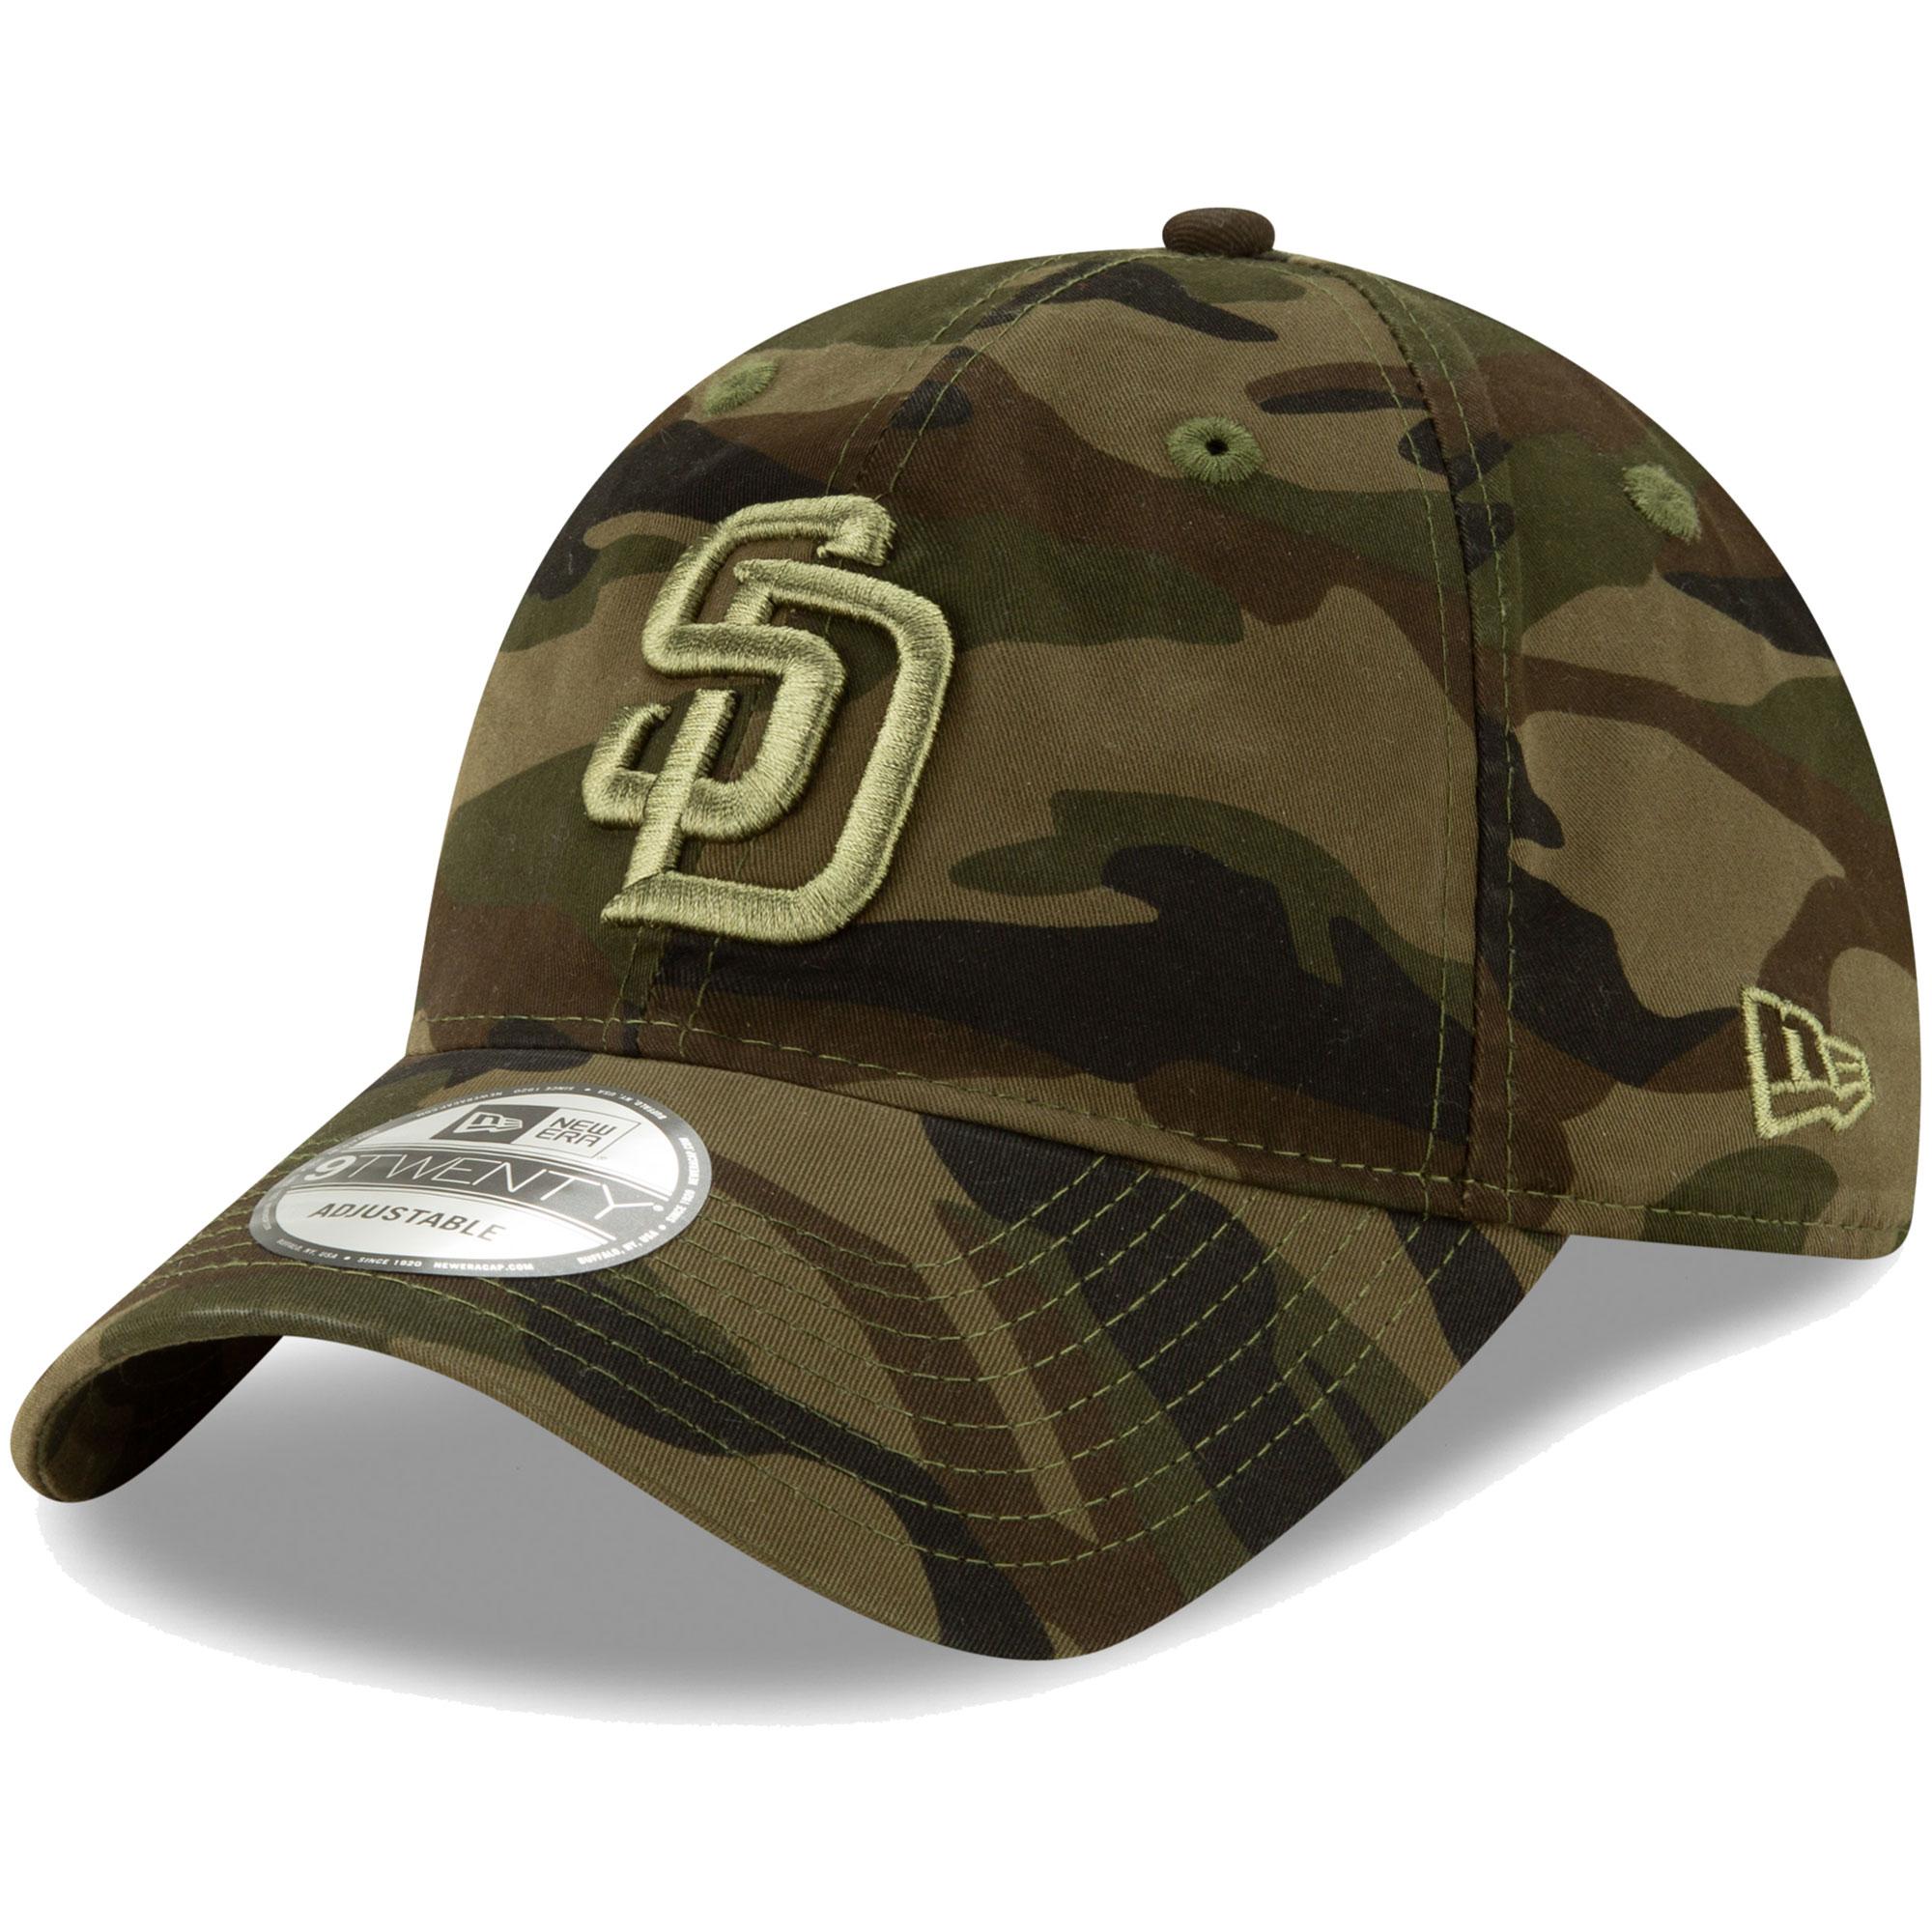 San Diego Padres New Era Tonal Camo Core Classic 9TWENTY Adjustable Hat - Camo - OSFA